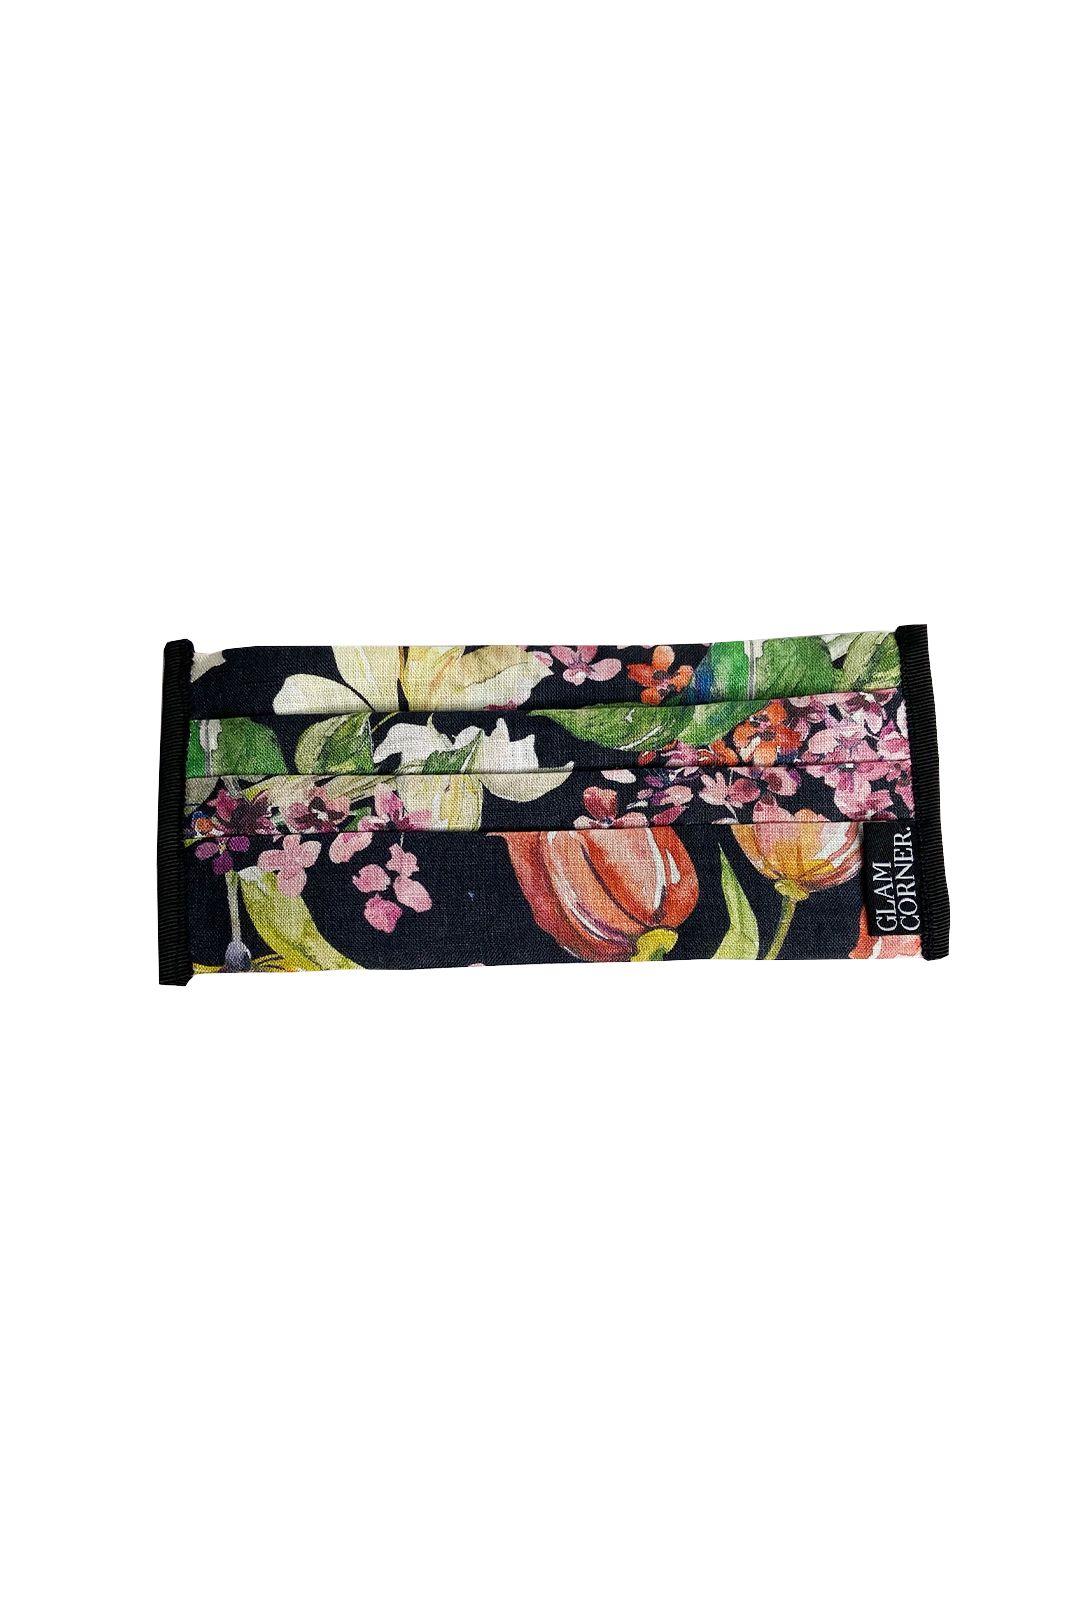 GlamCorner-Three-Layered-Fabric-Face-Masks-Black-Floral-Product